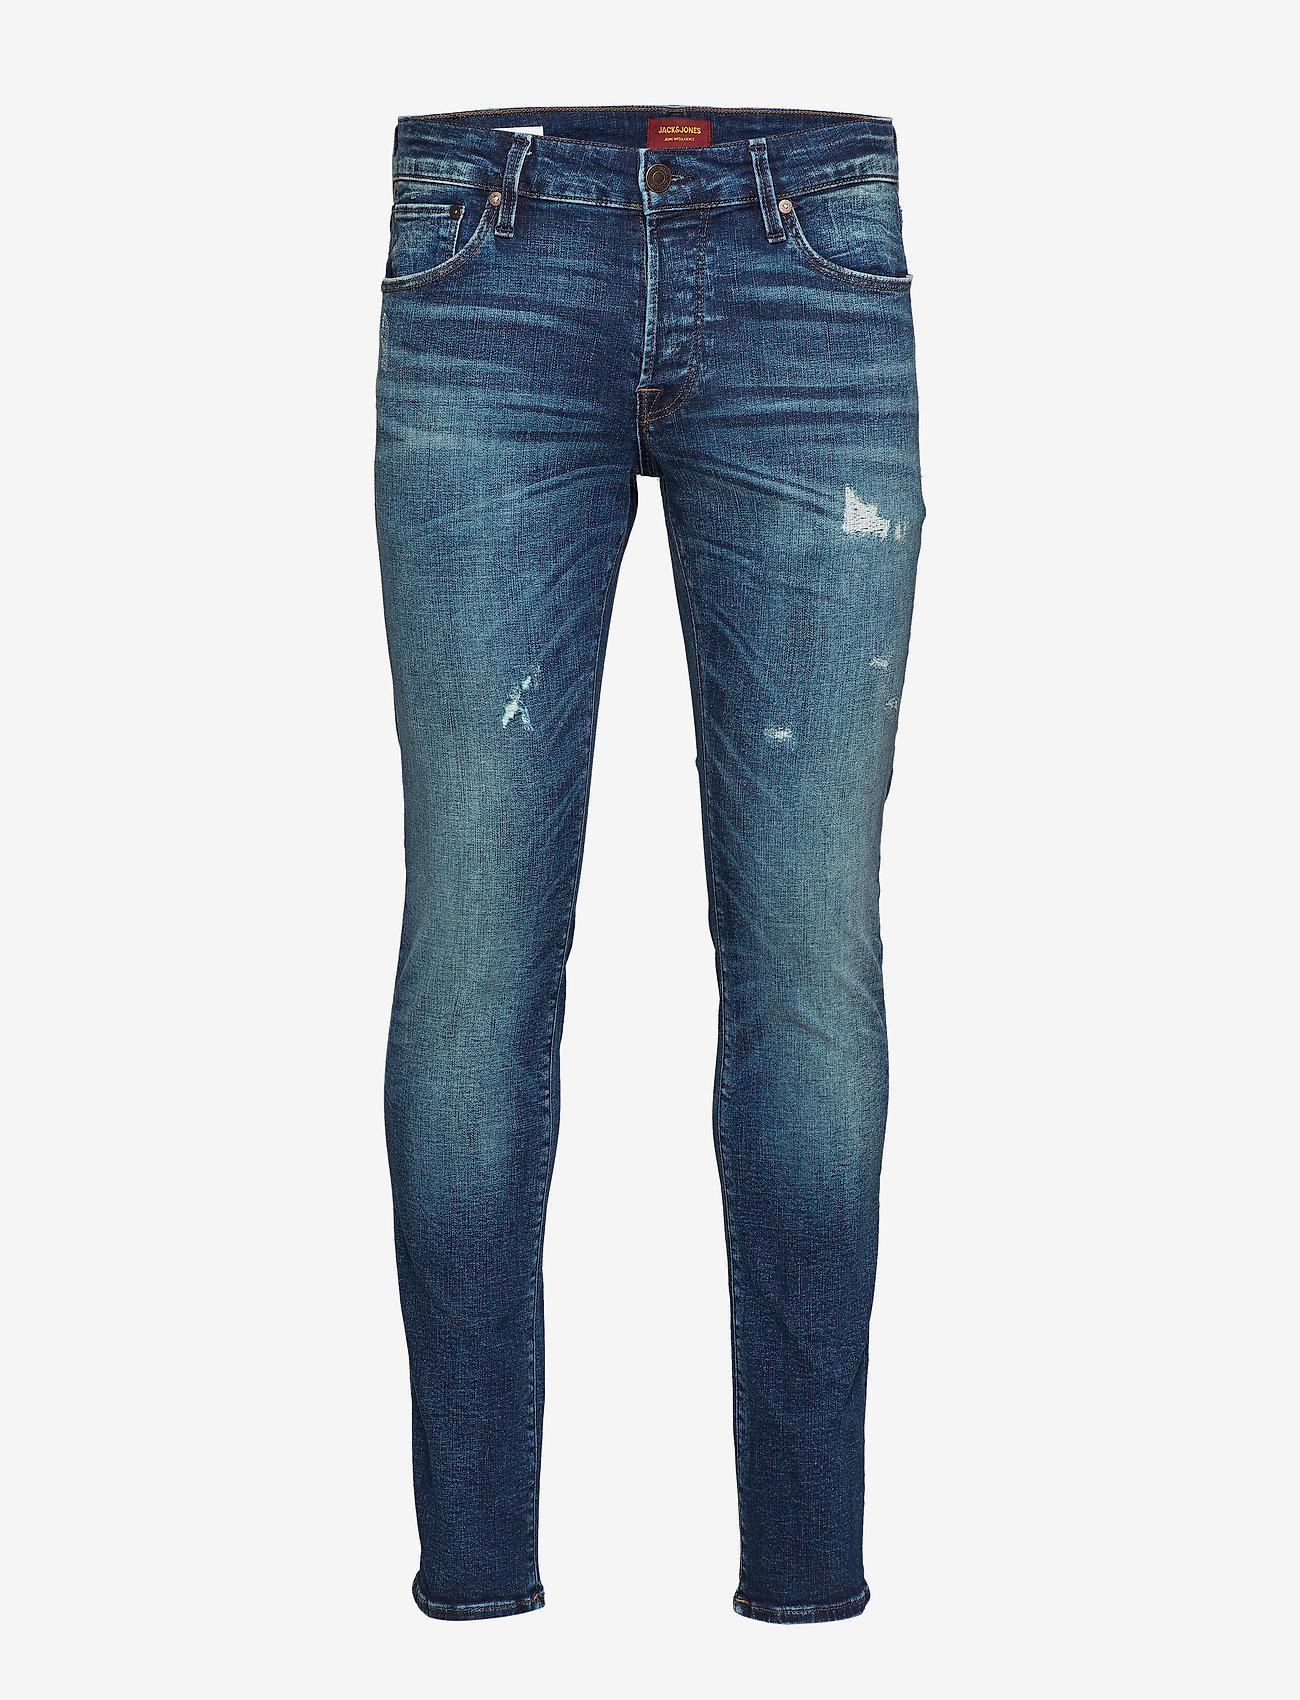 Jack & Jones - JJIGLENN JJICON JOS 424 50SPS NOOS - slim jeans - blue denim - 0